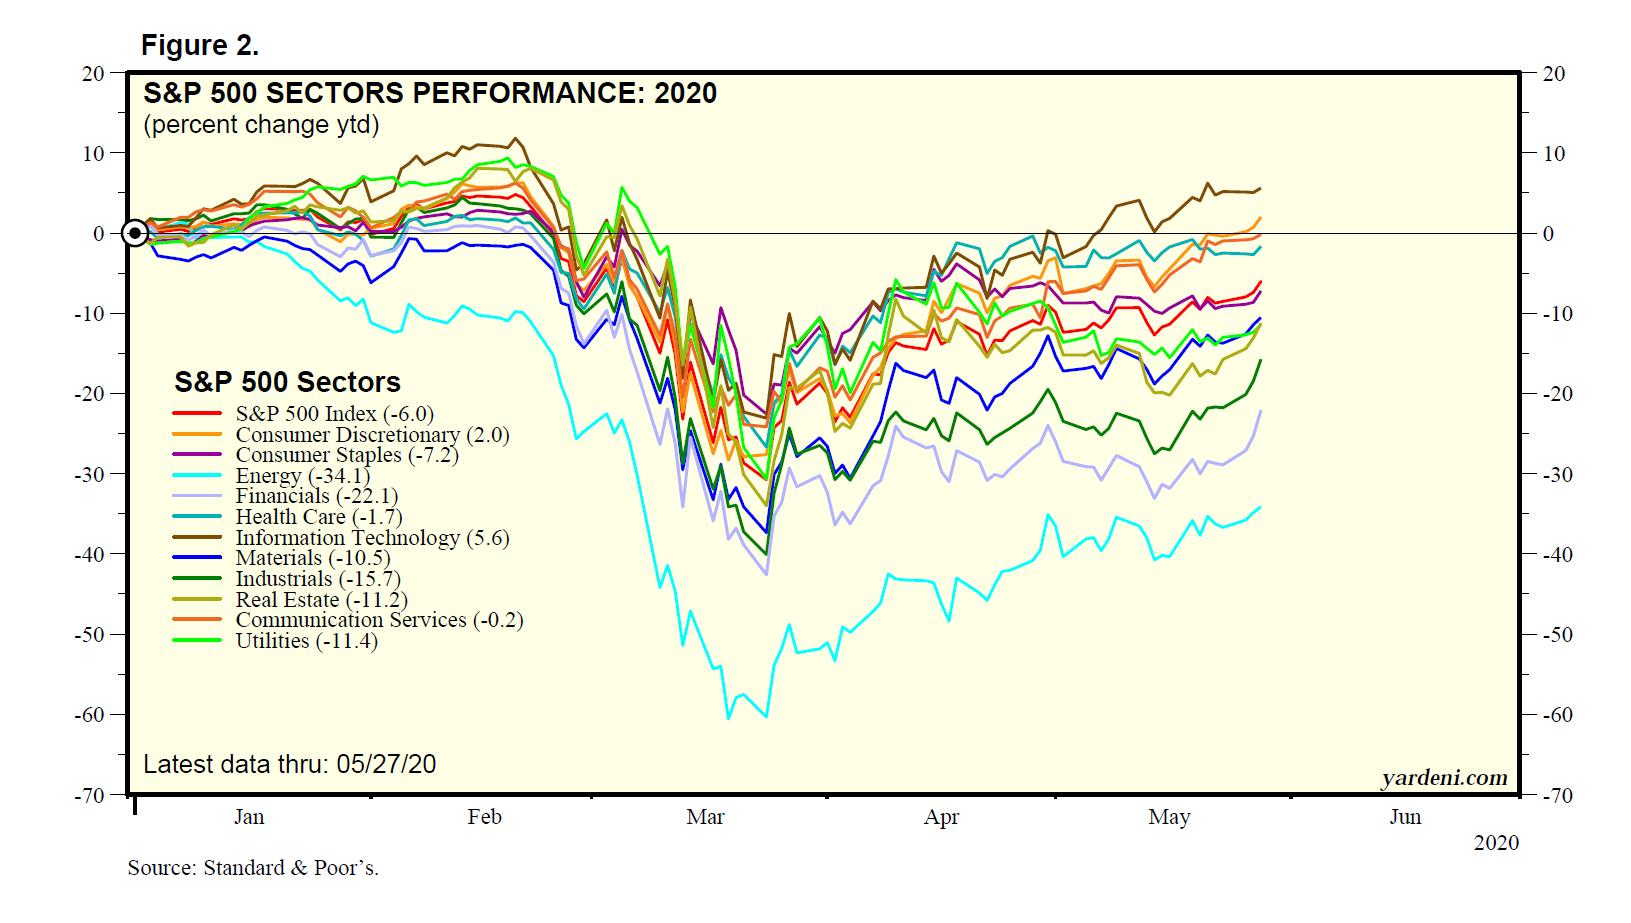 Figure 2: S&P 500 Sectors Performance